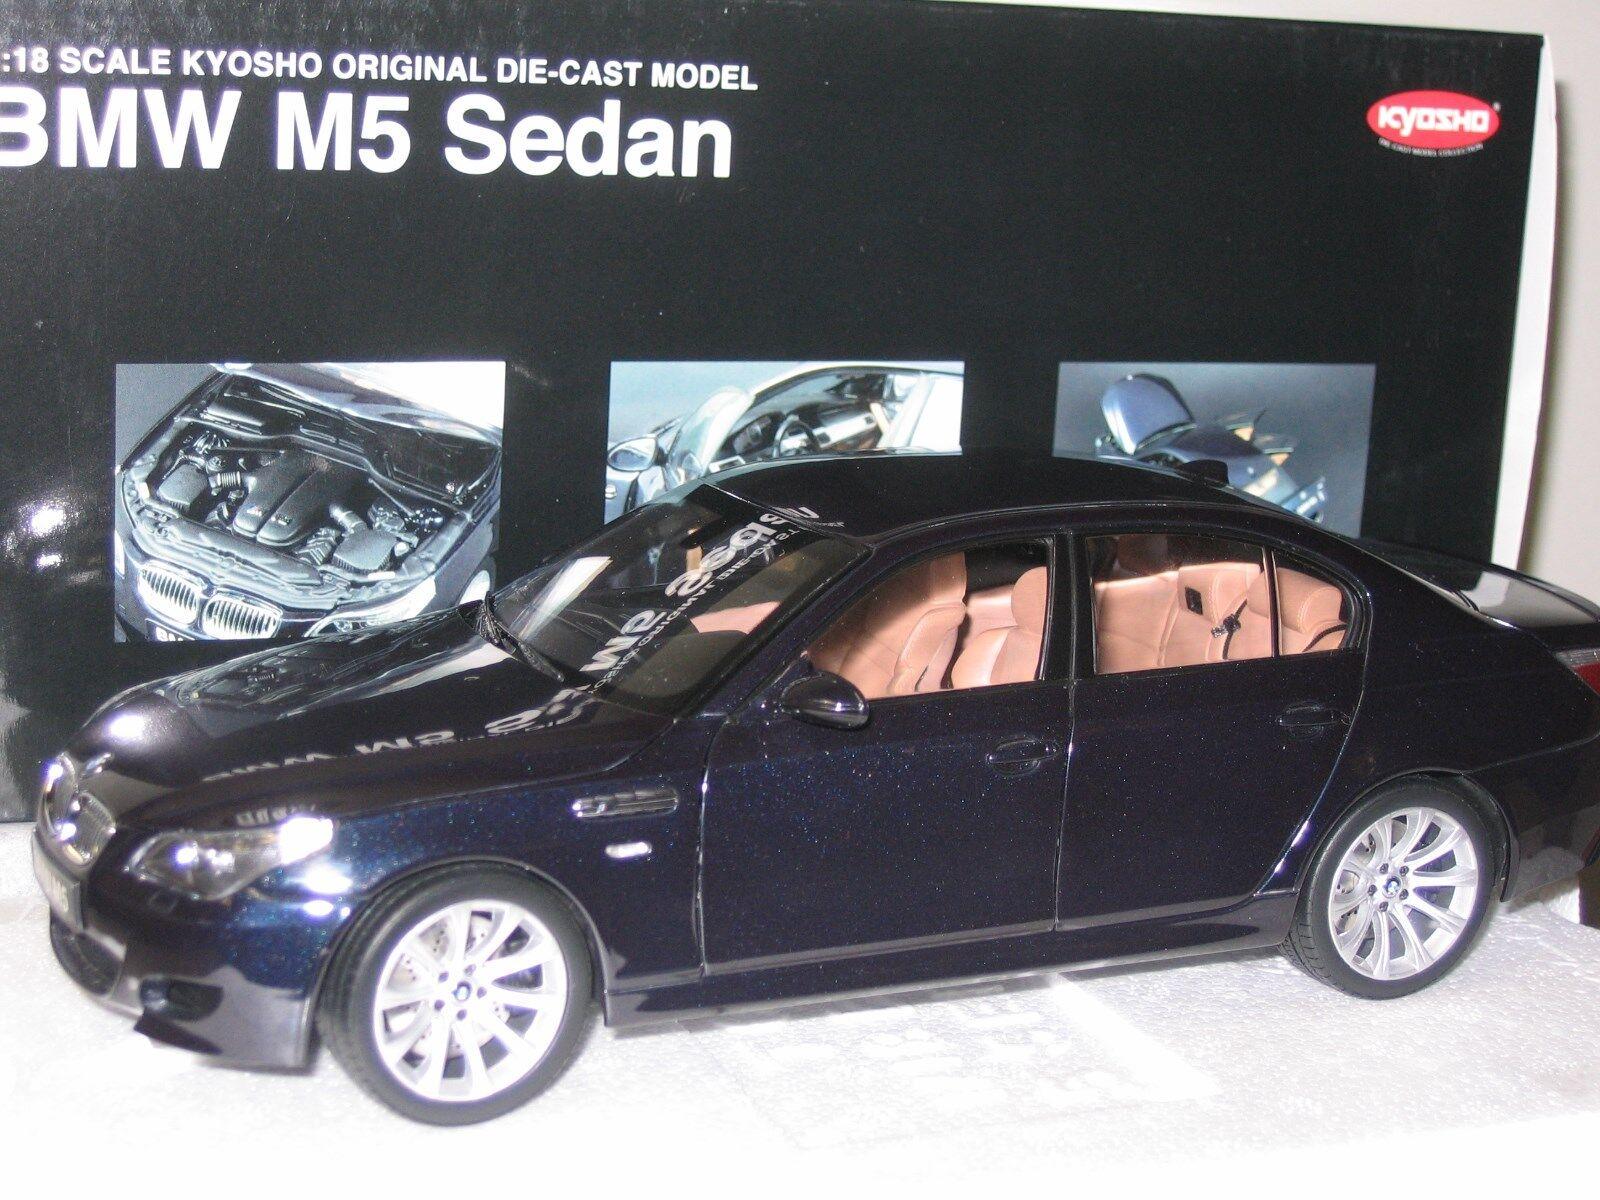 Kyosho BMW M5 Sedan, negro carbón, 08593BK Nuevo